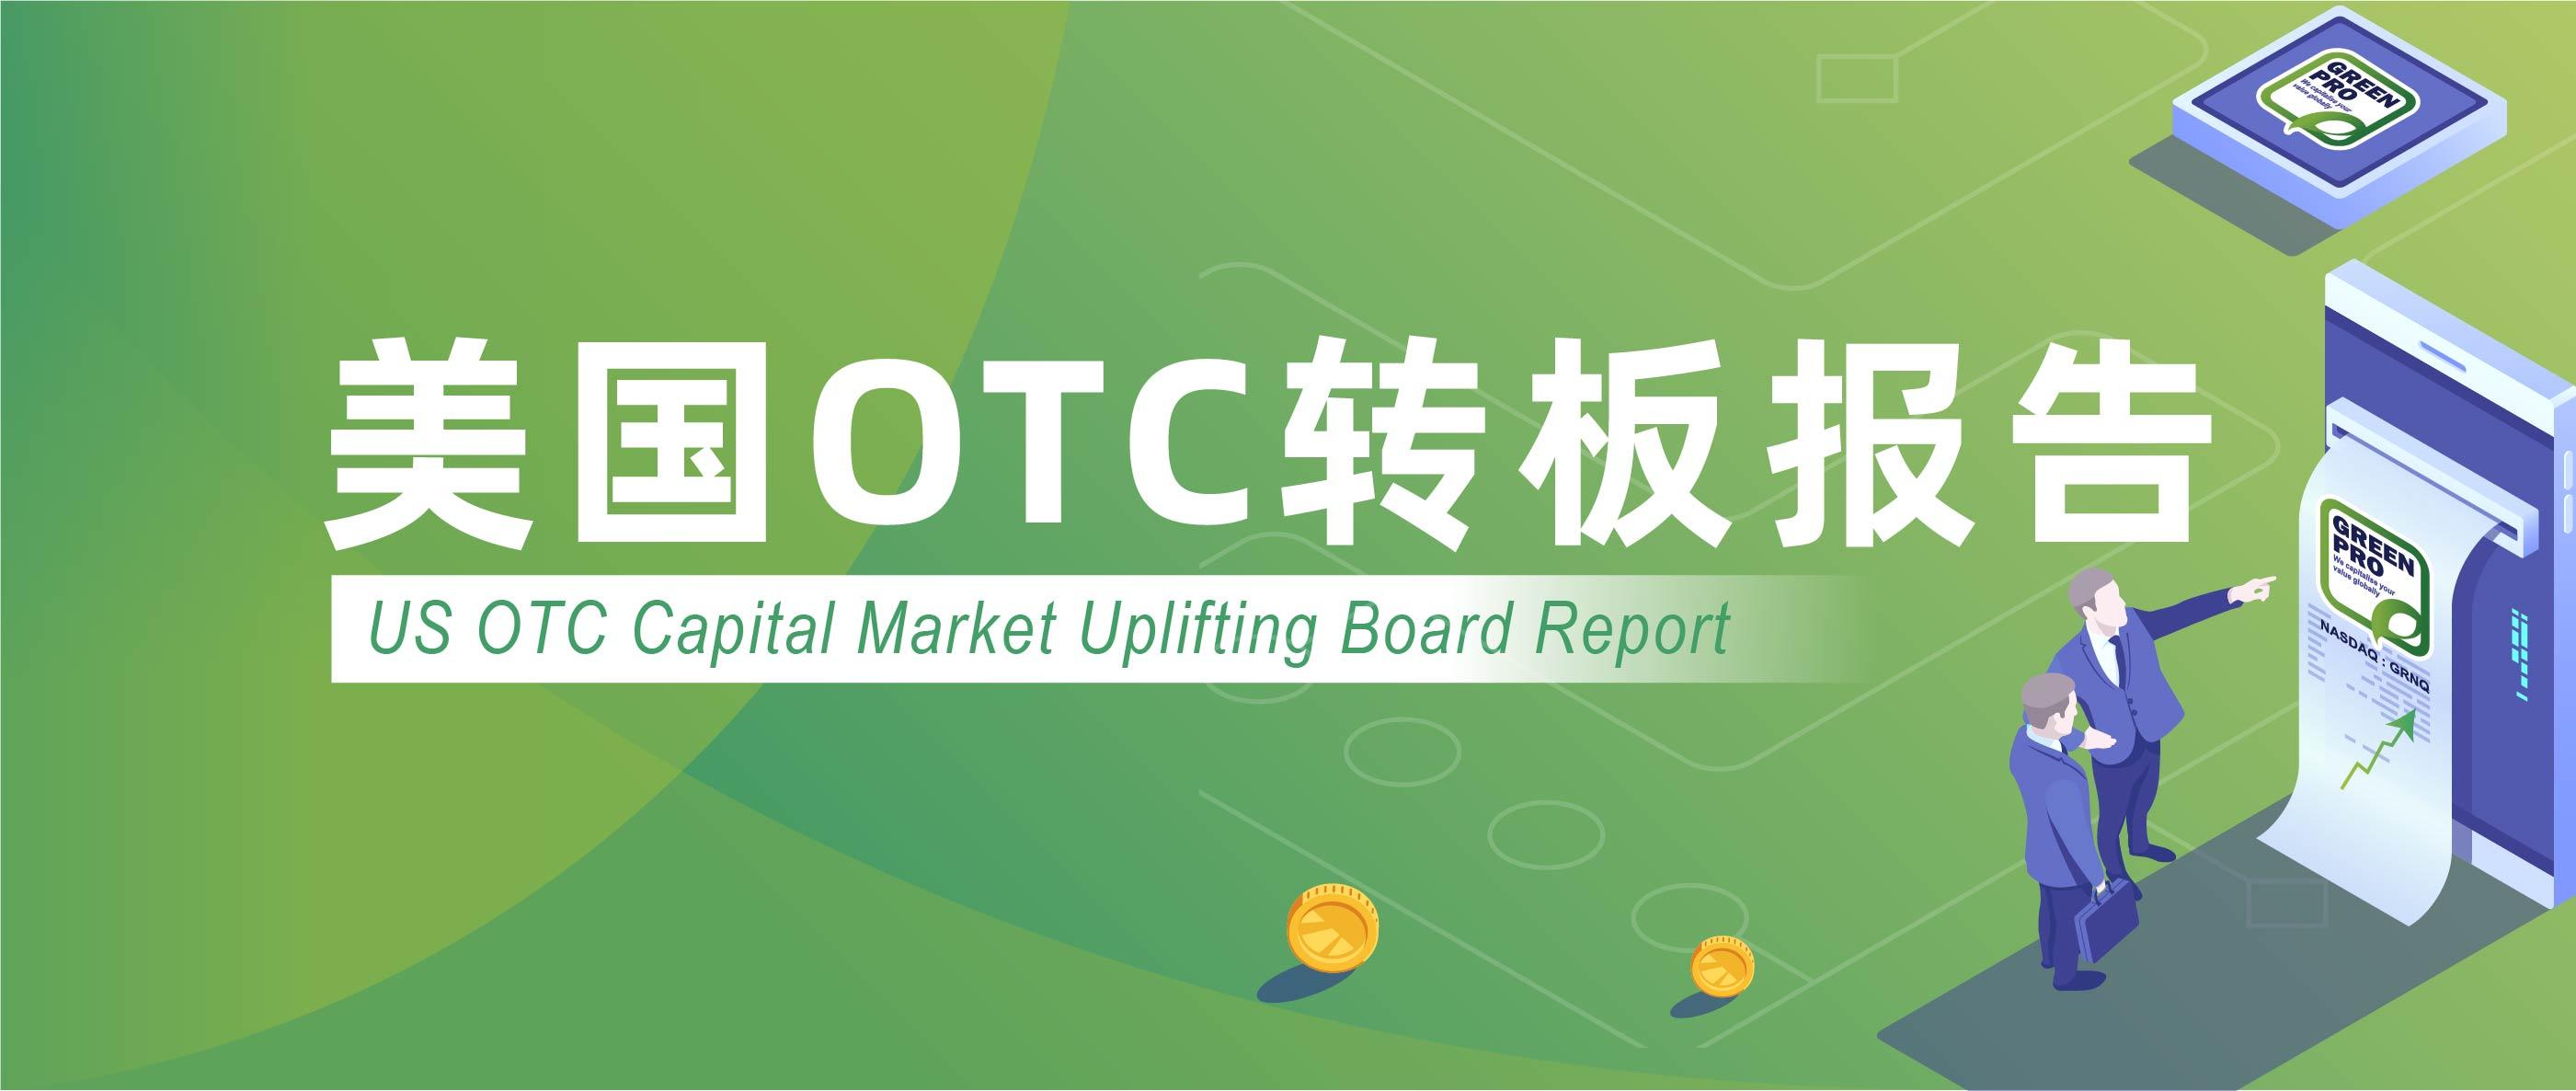 et41974261447191 - 美国OTC市场丨2021年2月新上市及转板(升主板)数据-海外上市